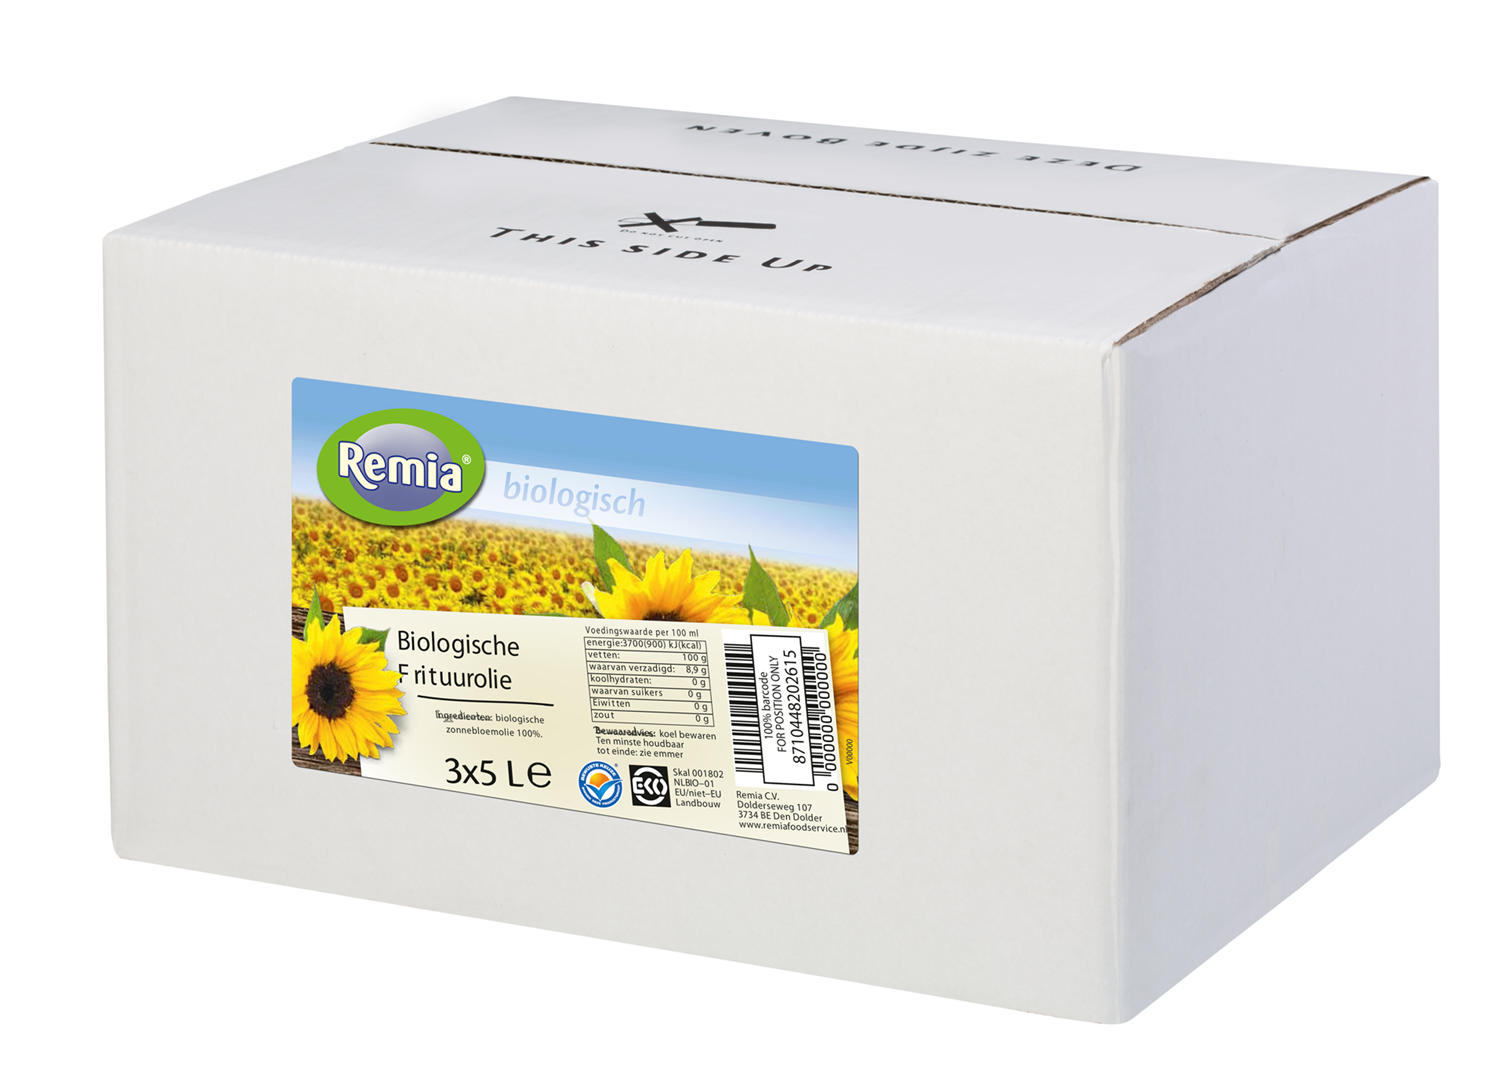 Productafbeelding Remia Biologische Frituurolie | Bag-in-Box 3 x 5 L